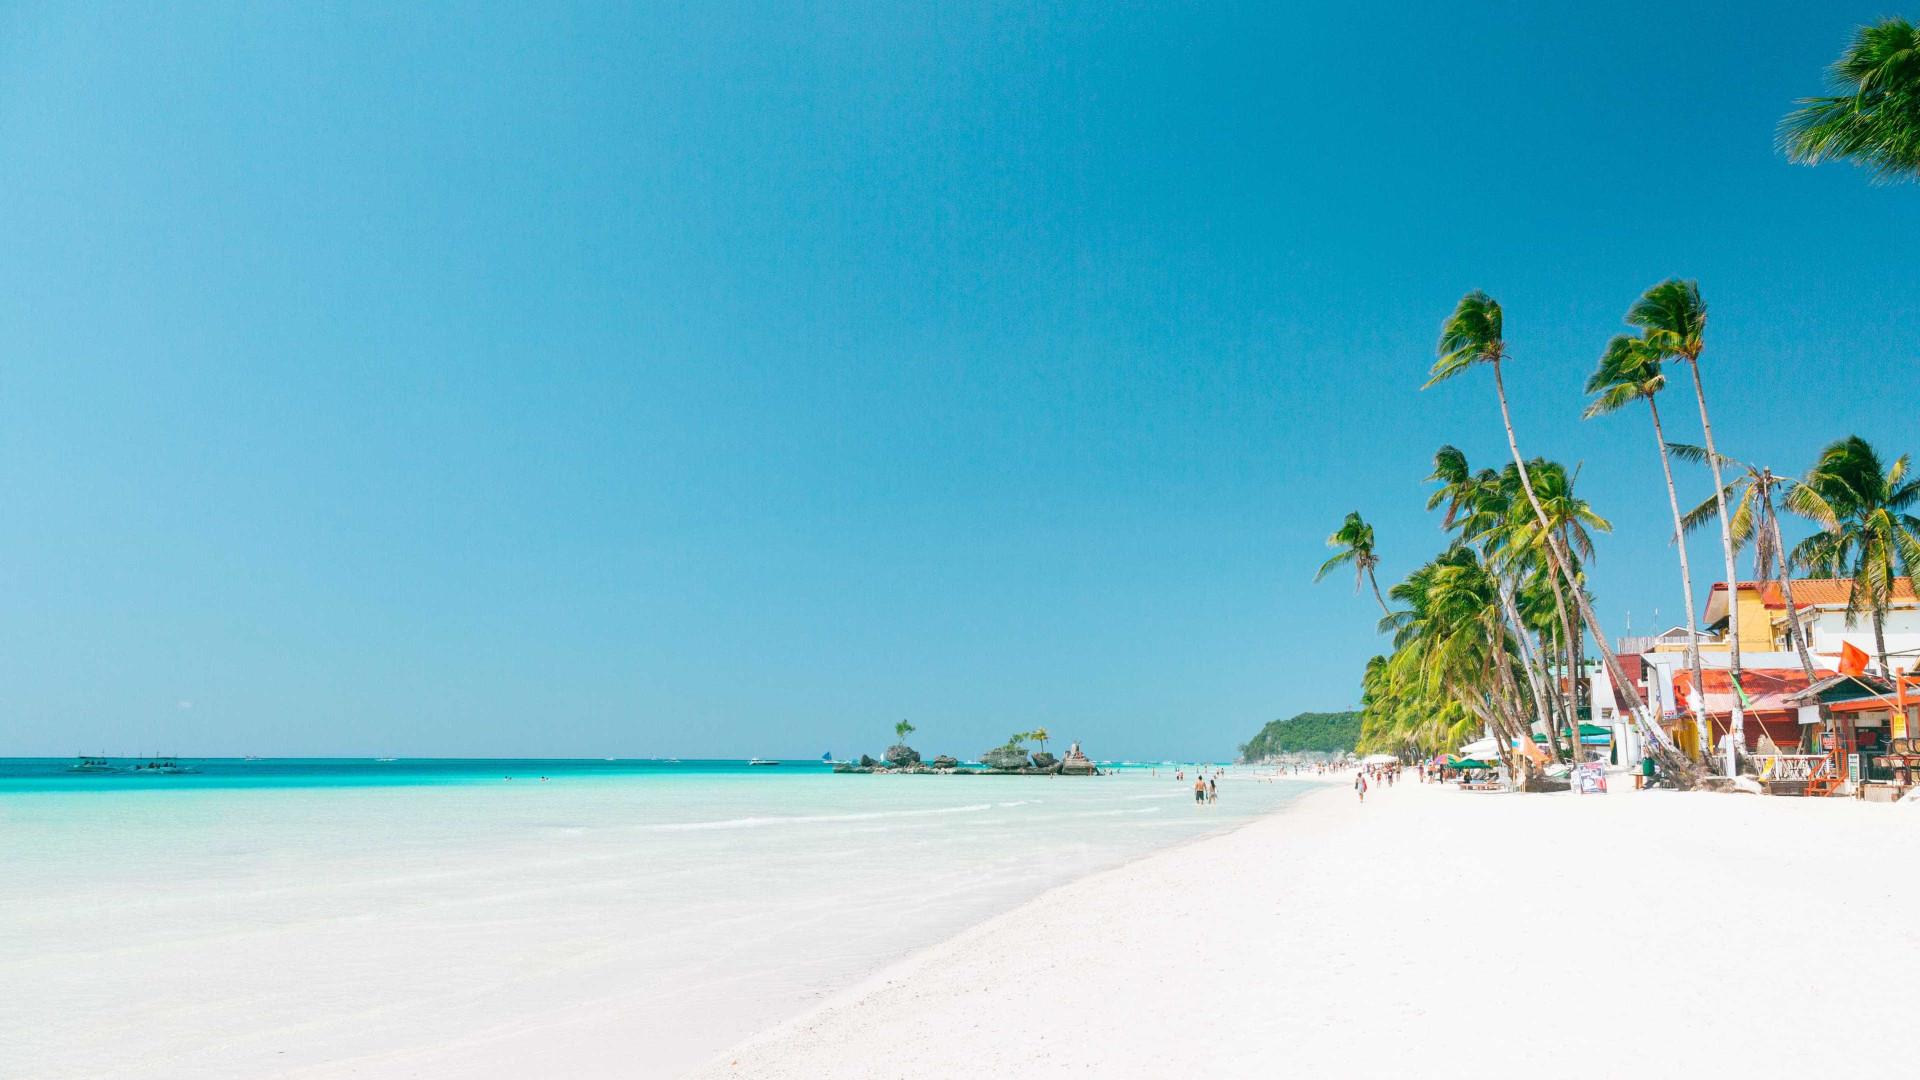 Ilha de Boracay, nas Filipinas, reabre para turismo